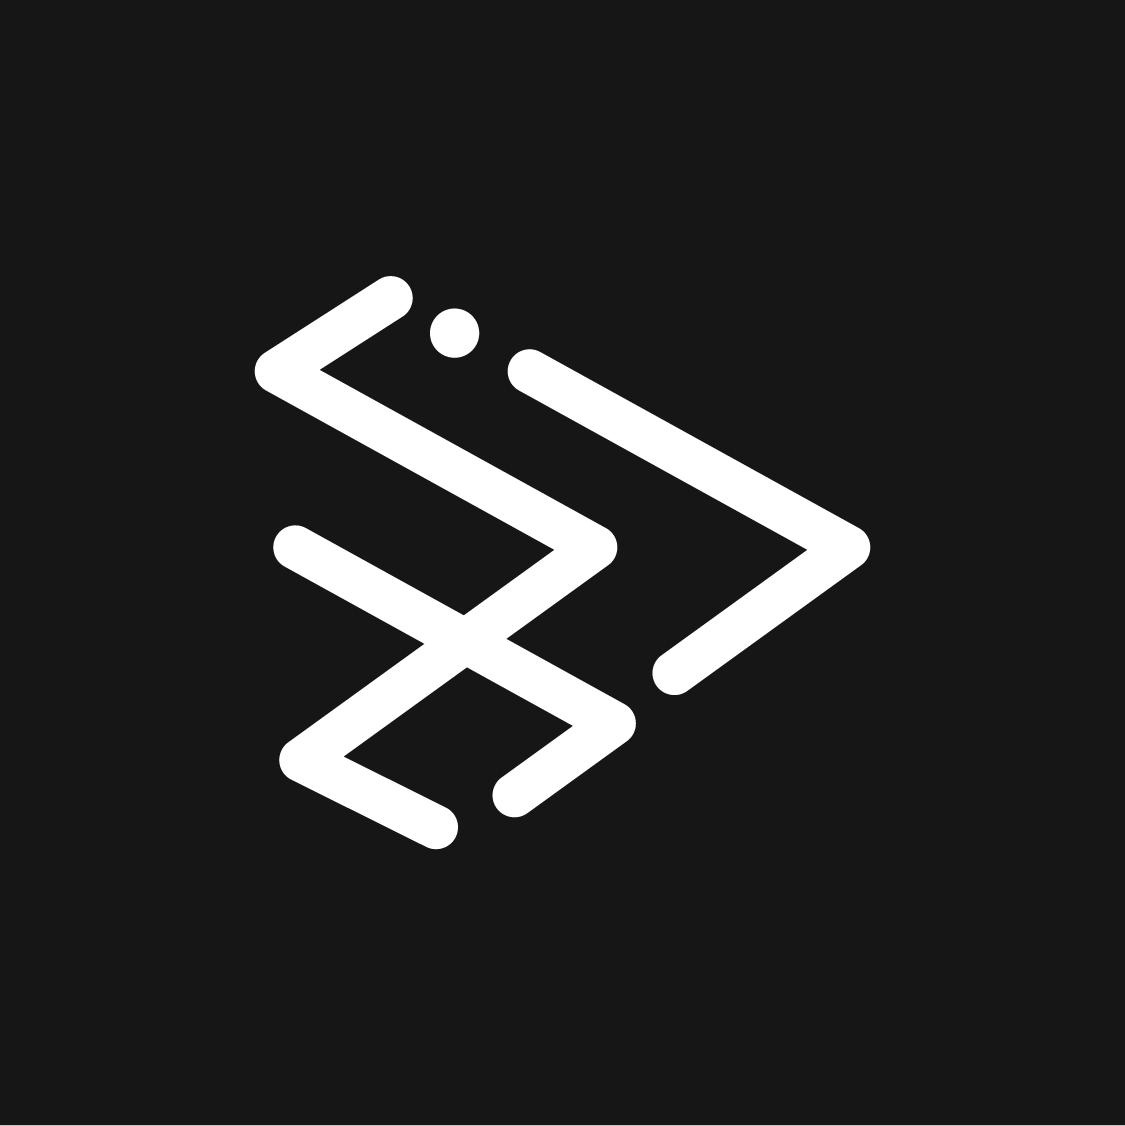 all-logos-2020-61